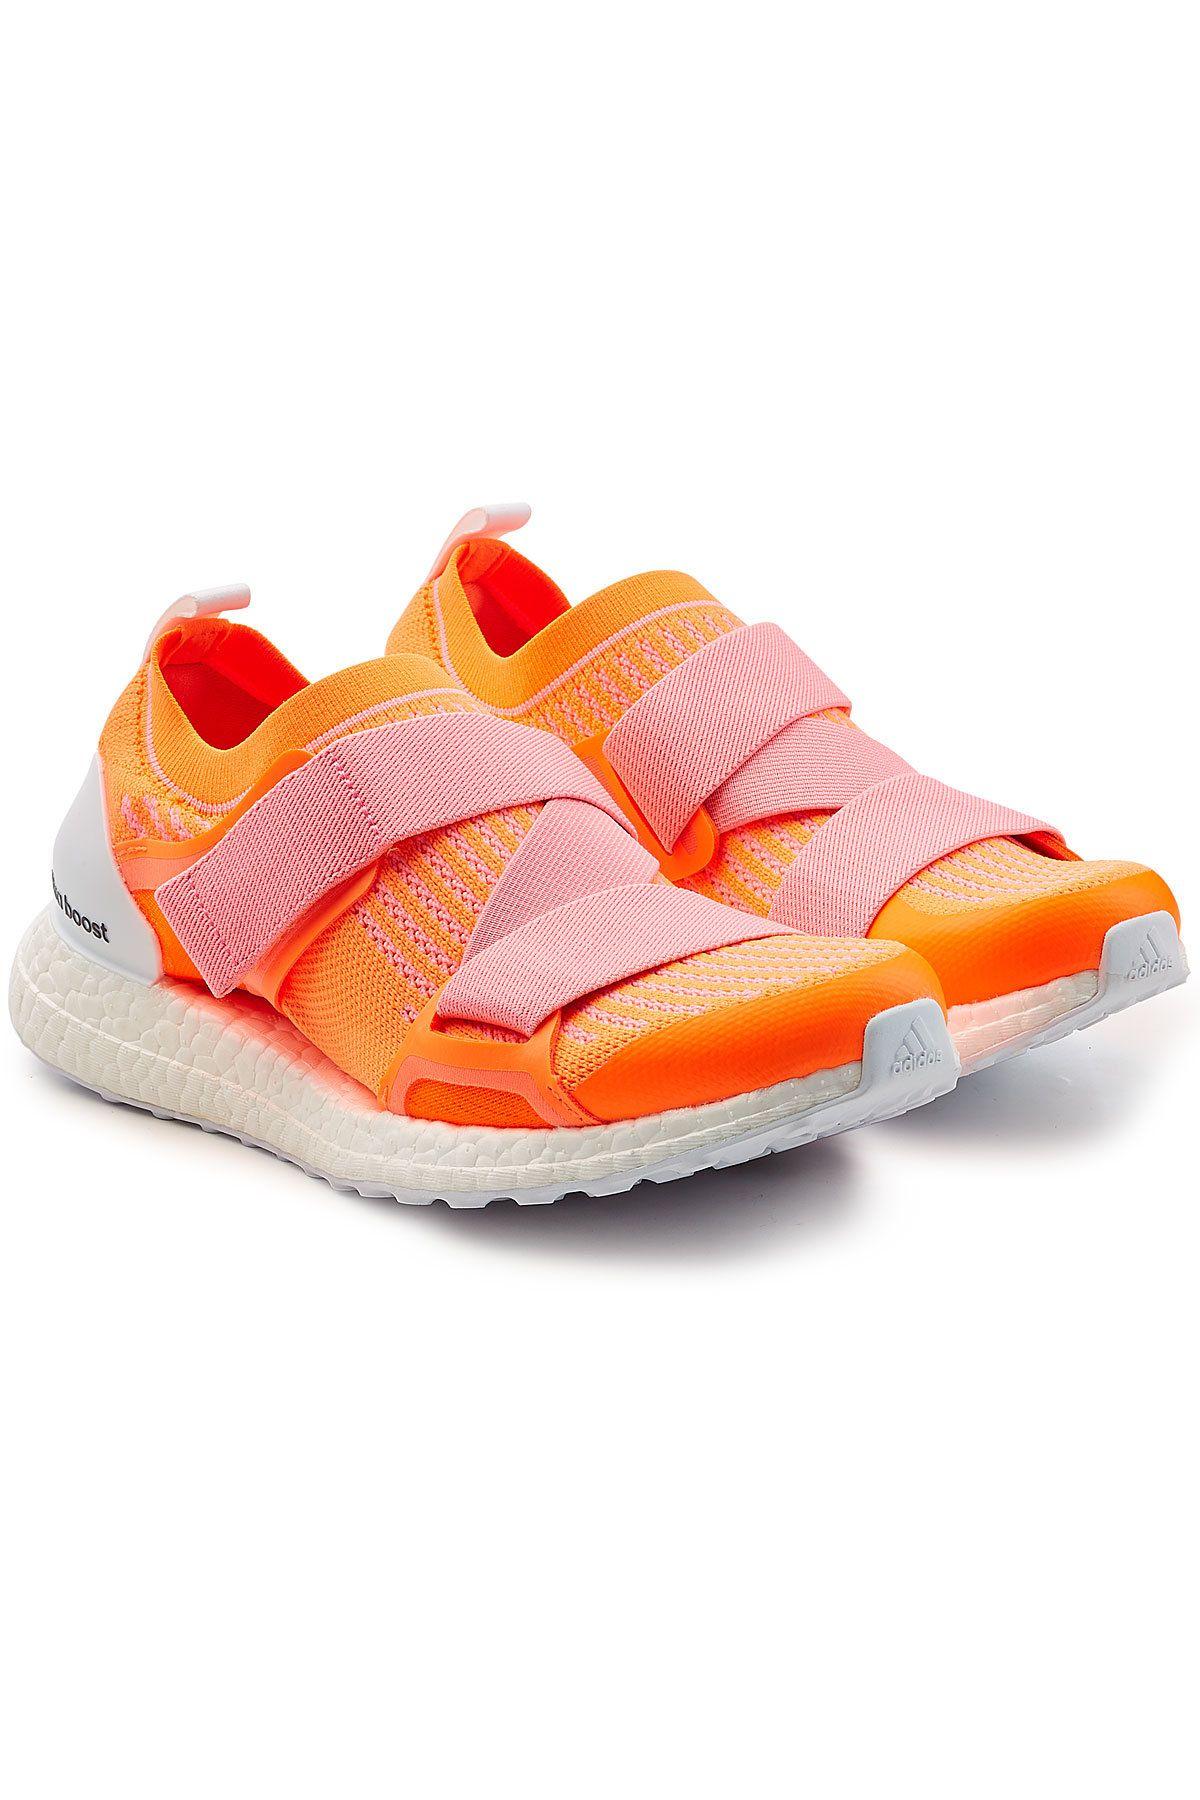 adidas da stella mccartney ultraboost x scarpe, scarpe pinterest